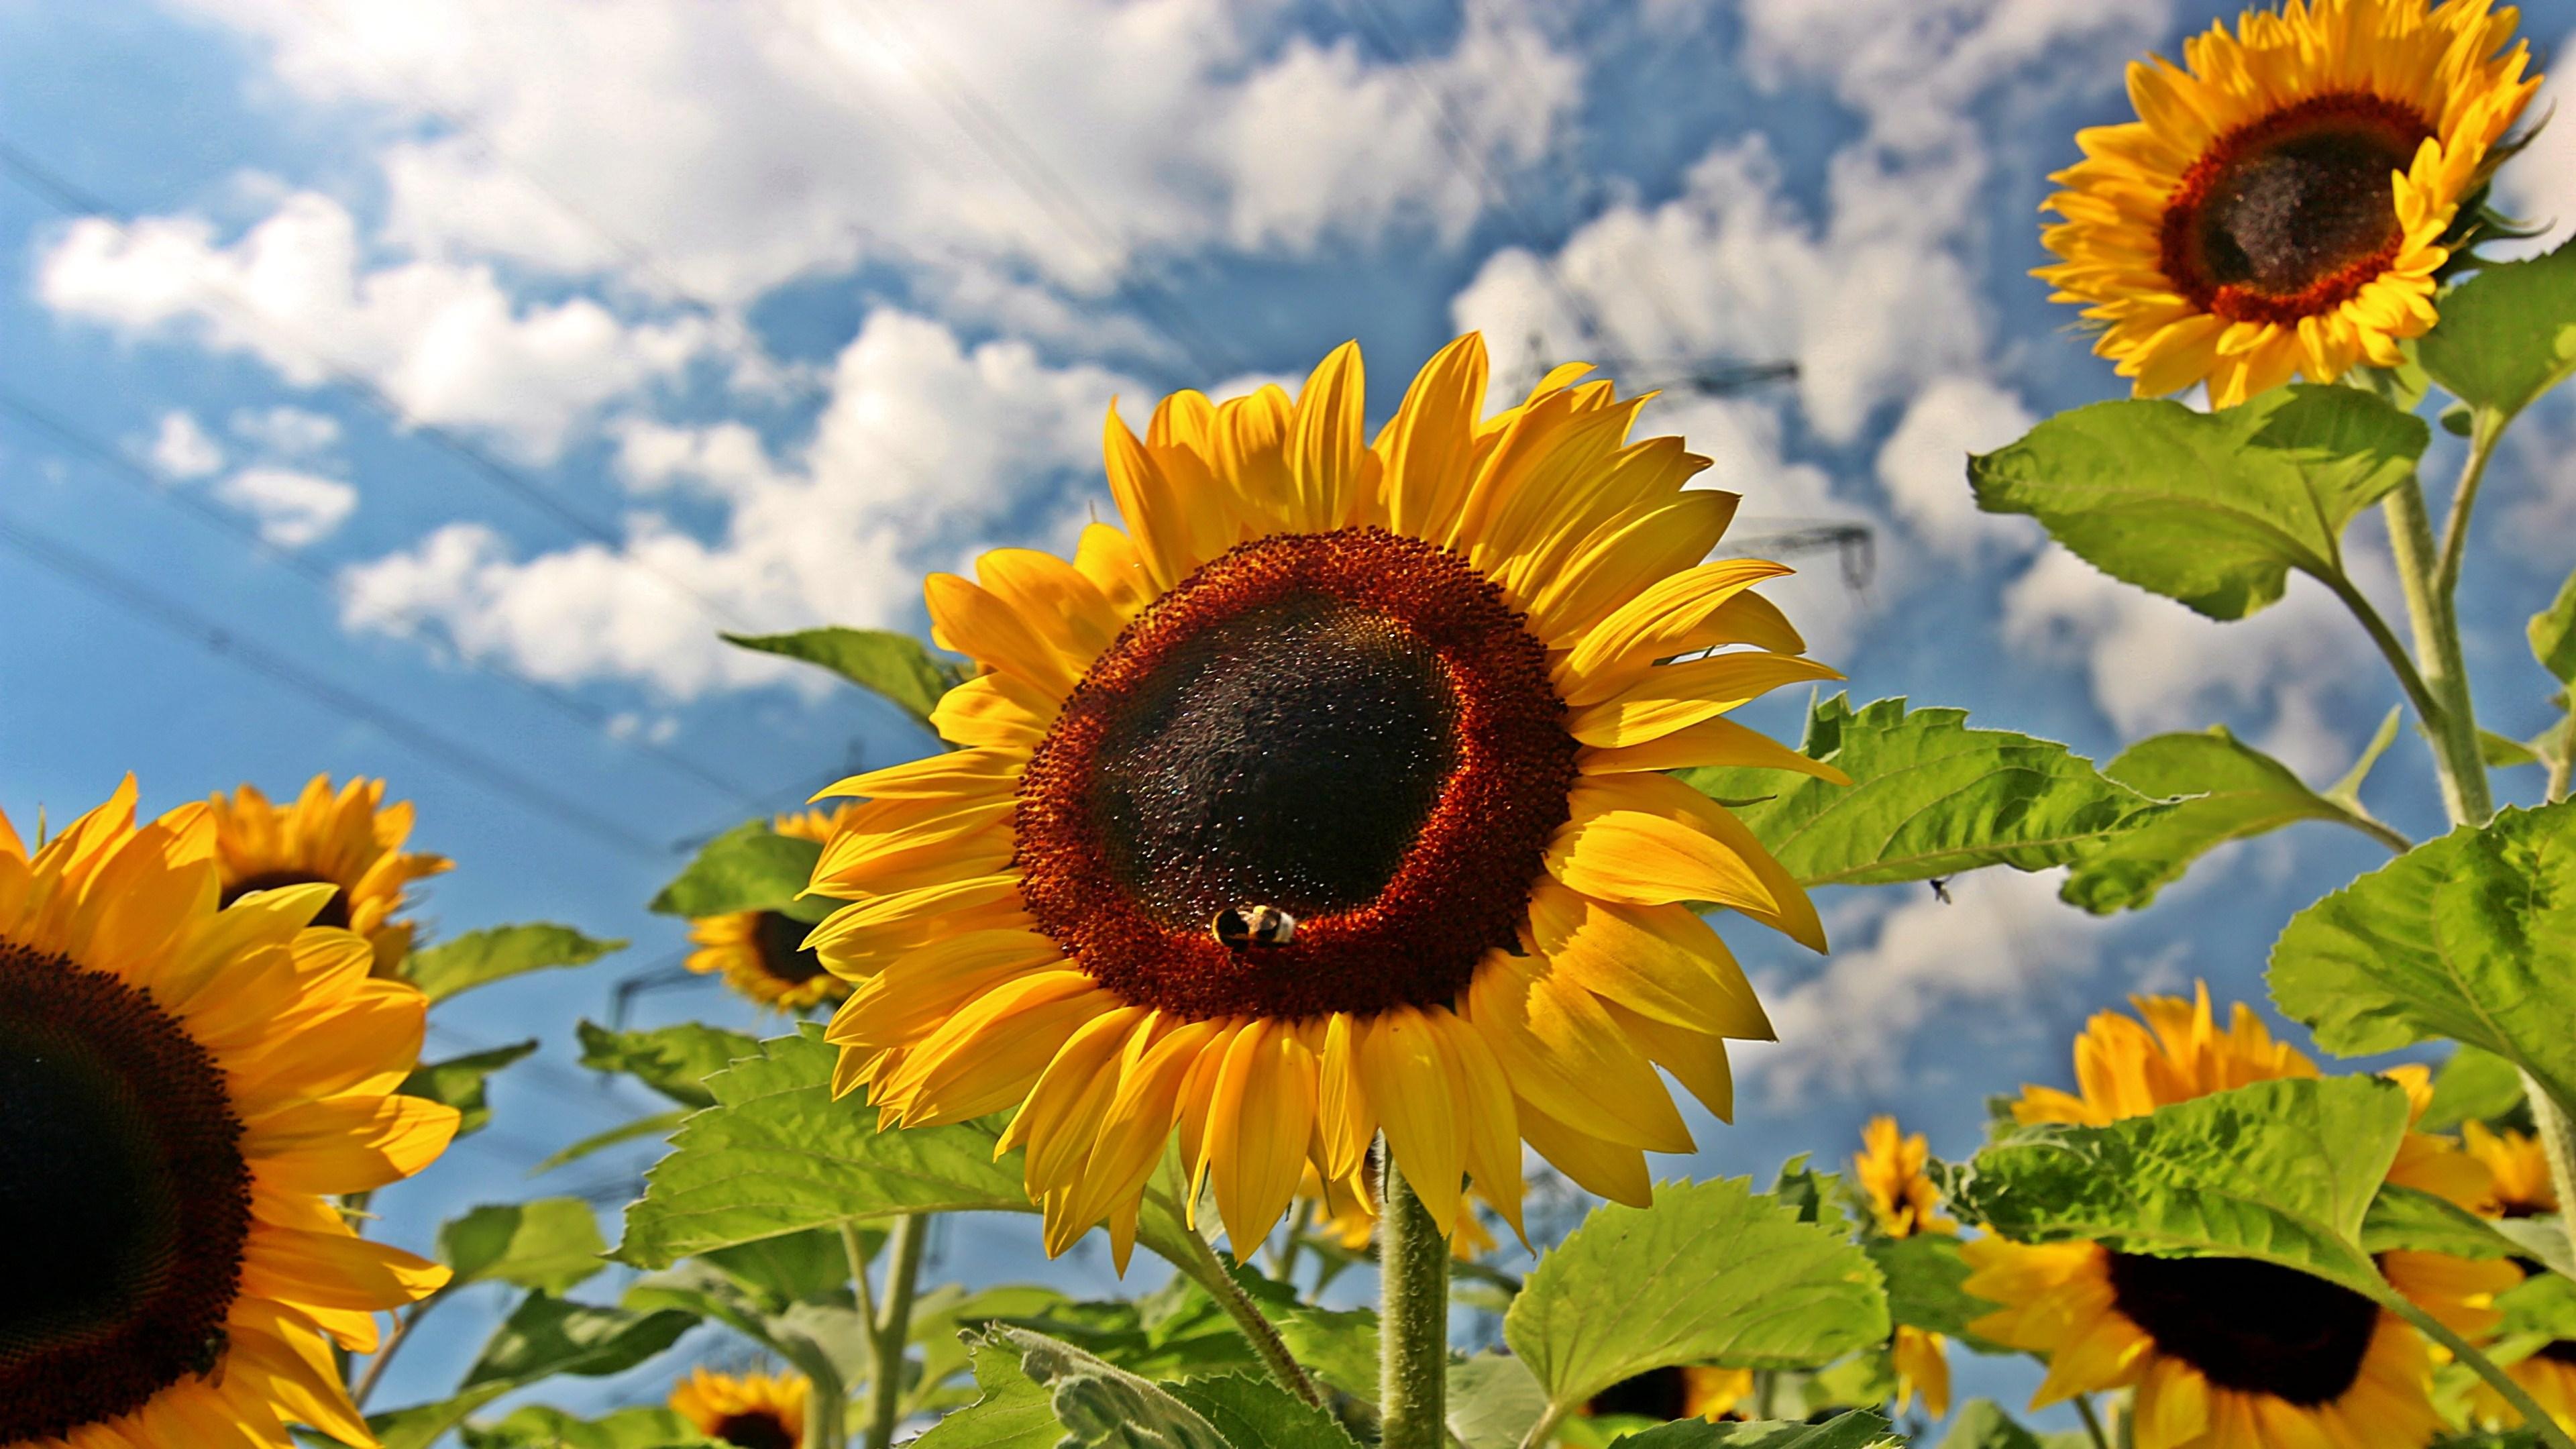 Sunflower 4k Ultra HD Wallpaper   Background Image ...